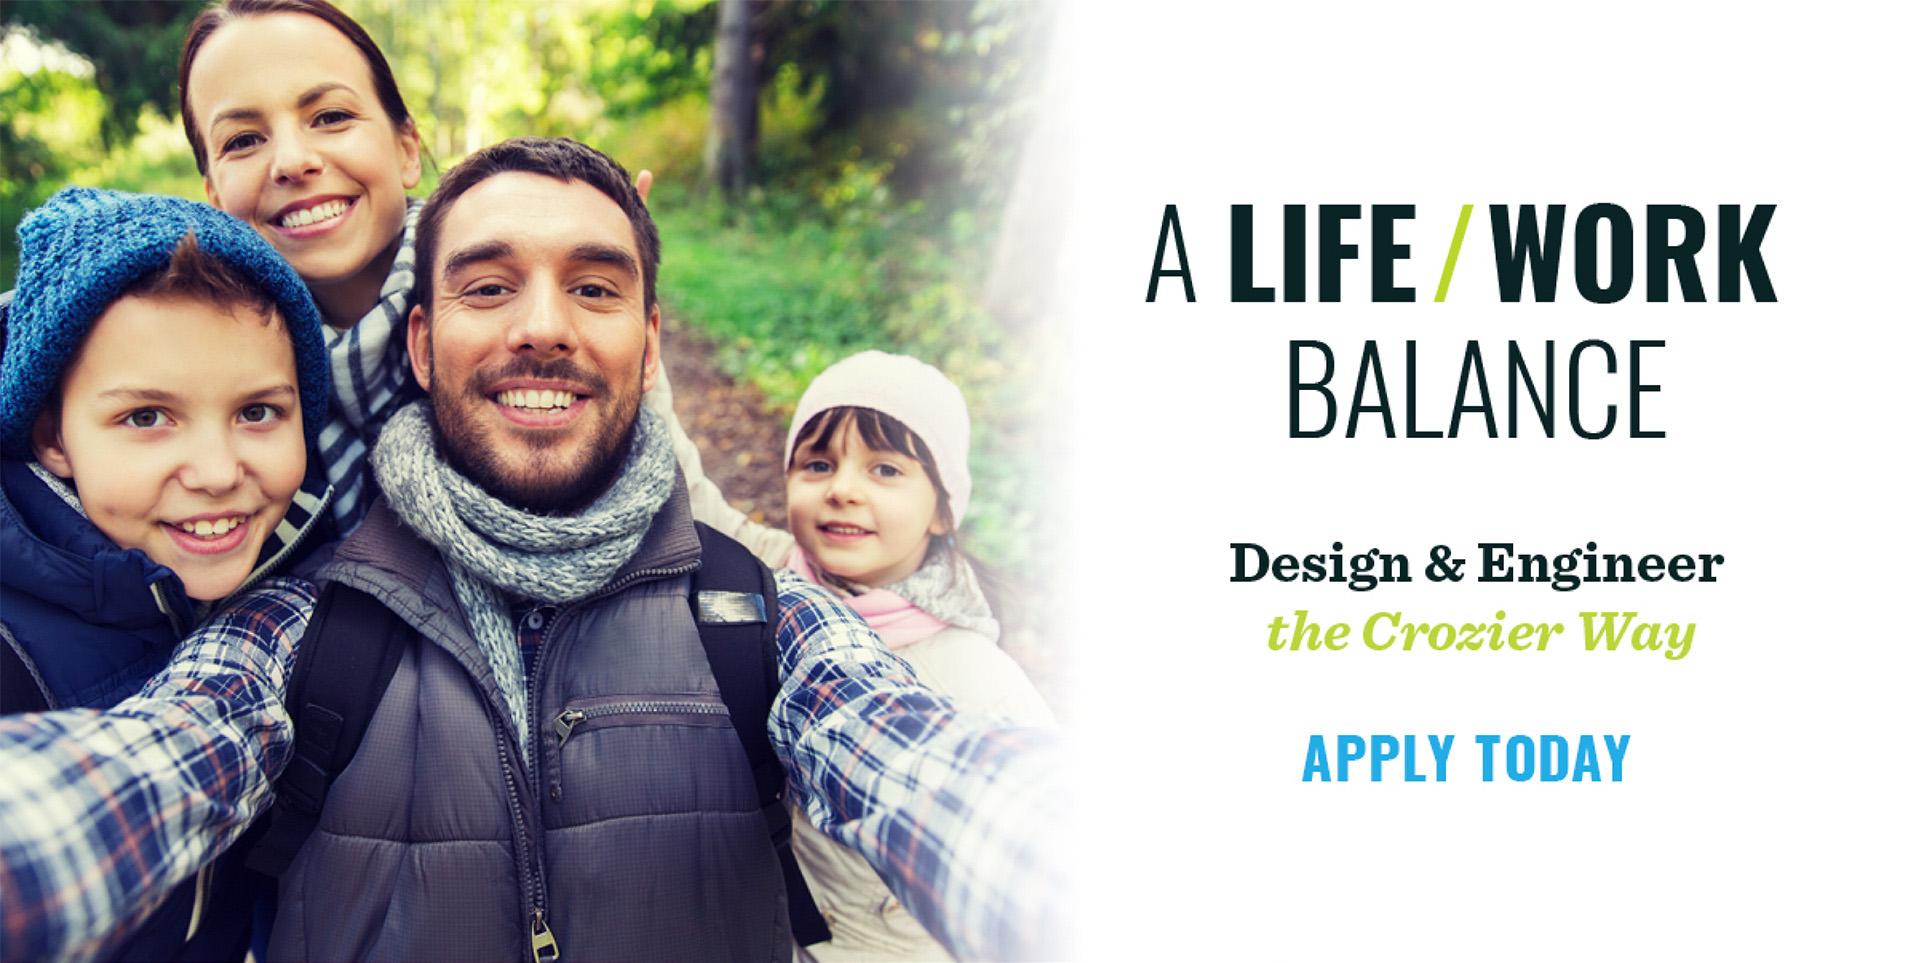 A Life / Work Balance